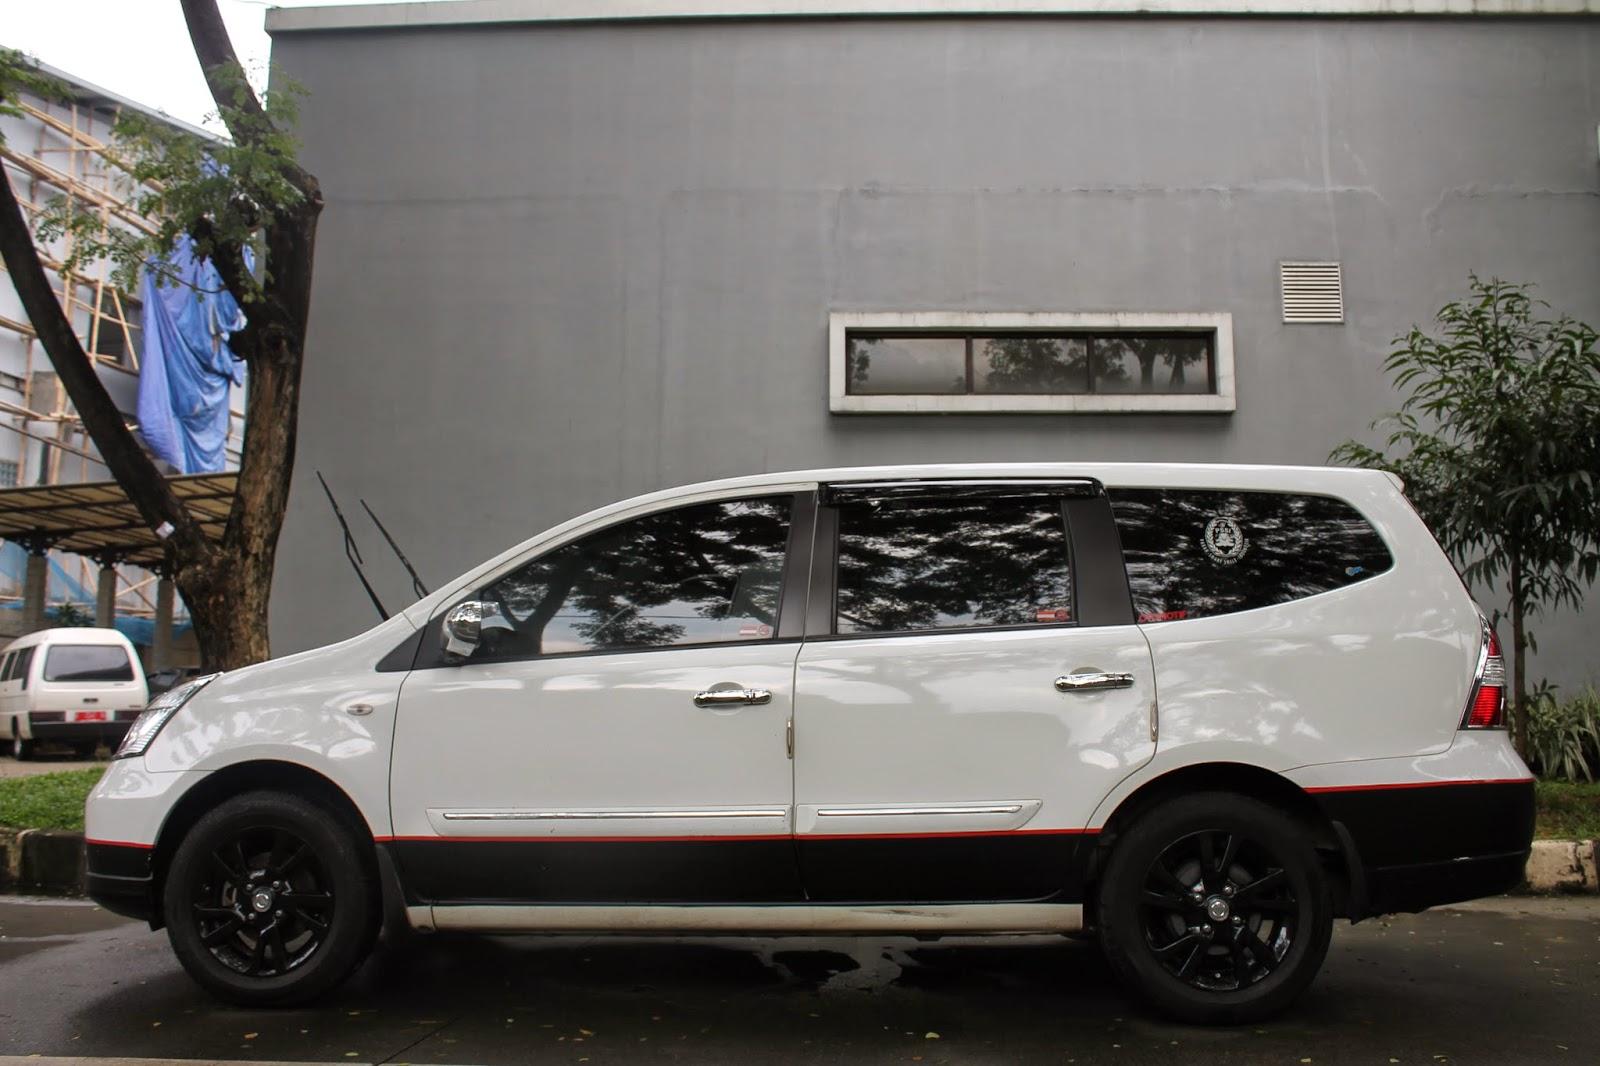 Kumpulan gambar cutting sticker mobil grand livina